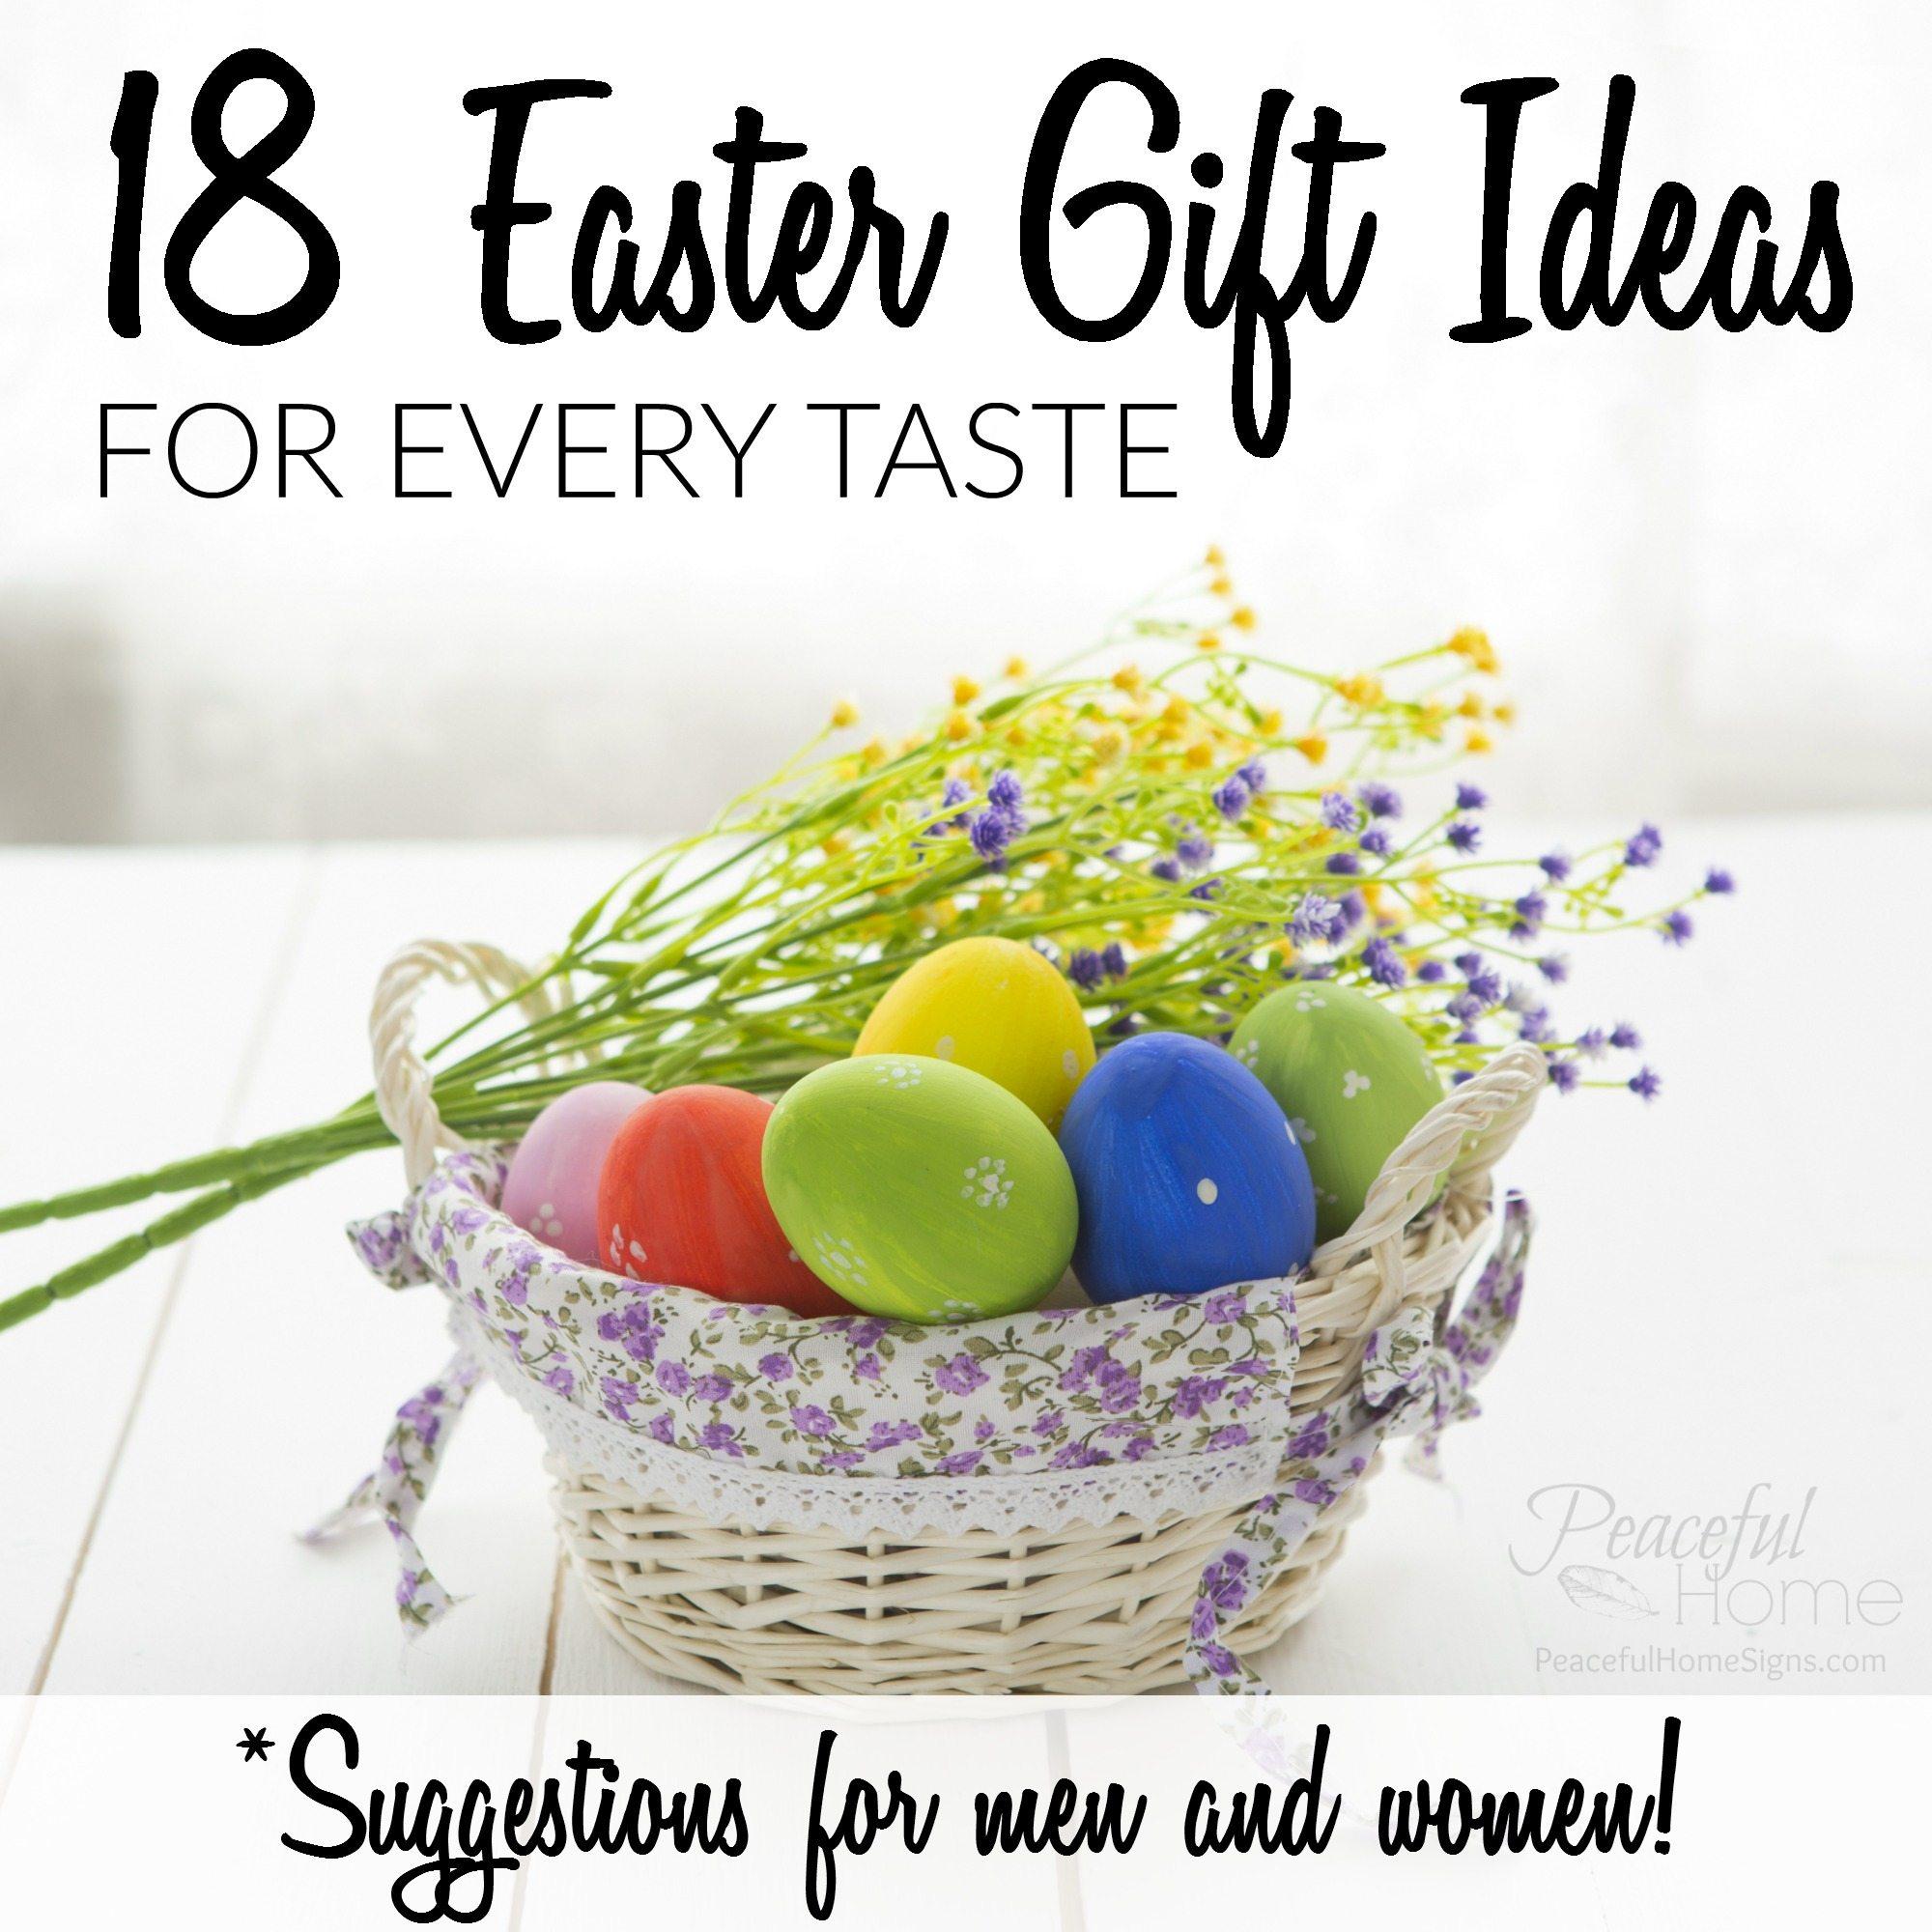 18 Easter Gift Ideas For Every Taste Men Women Peaceful Home